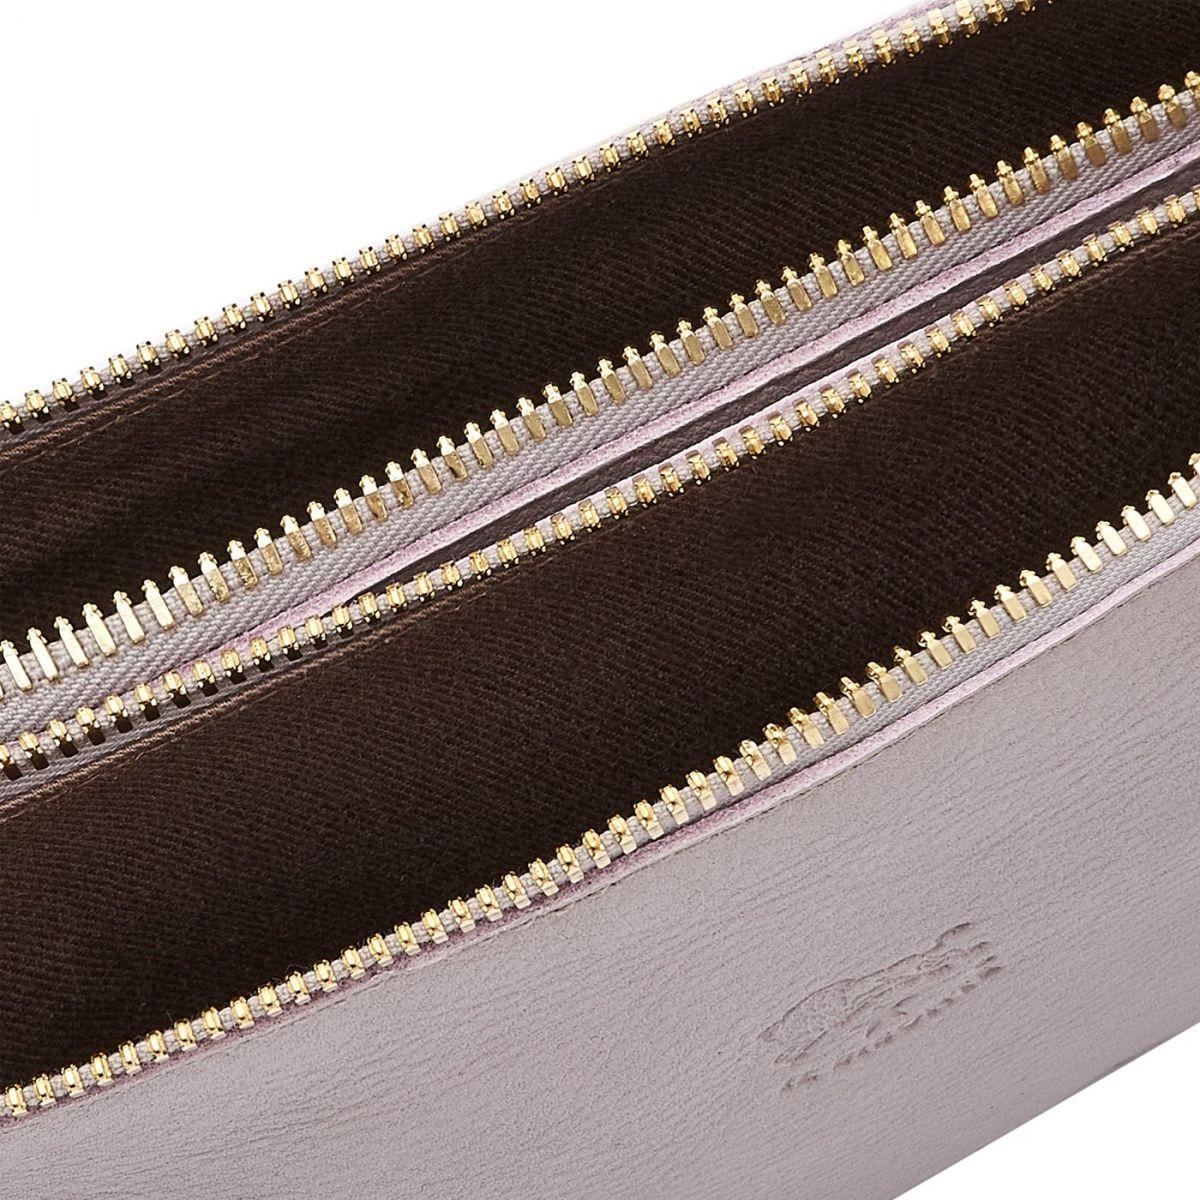 Giulia - Women's Clutch Bag in Cowhide Leather color Mauve - Talamone line BCL022 | Details